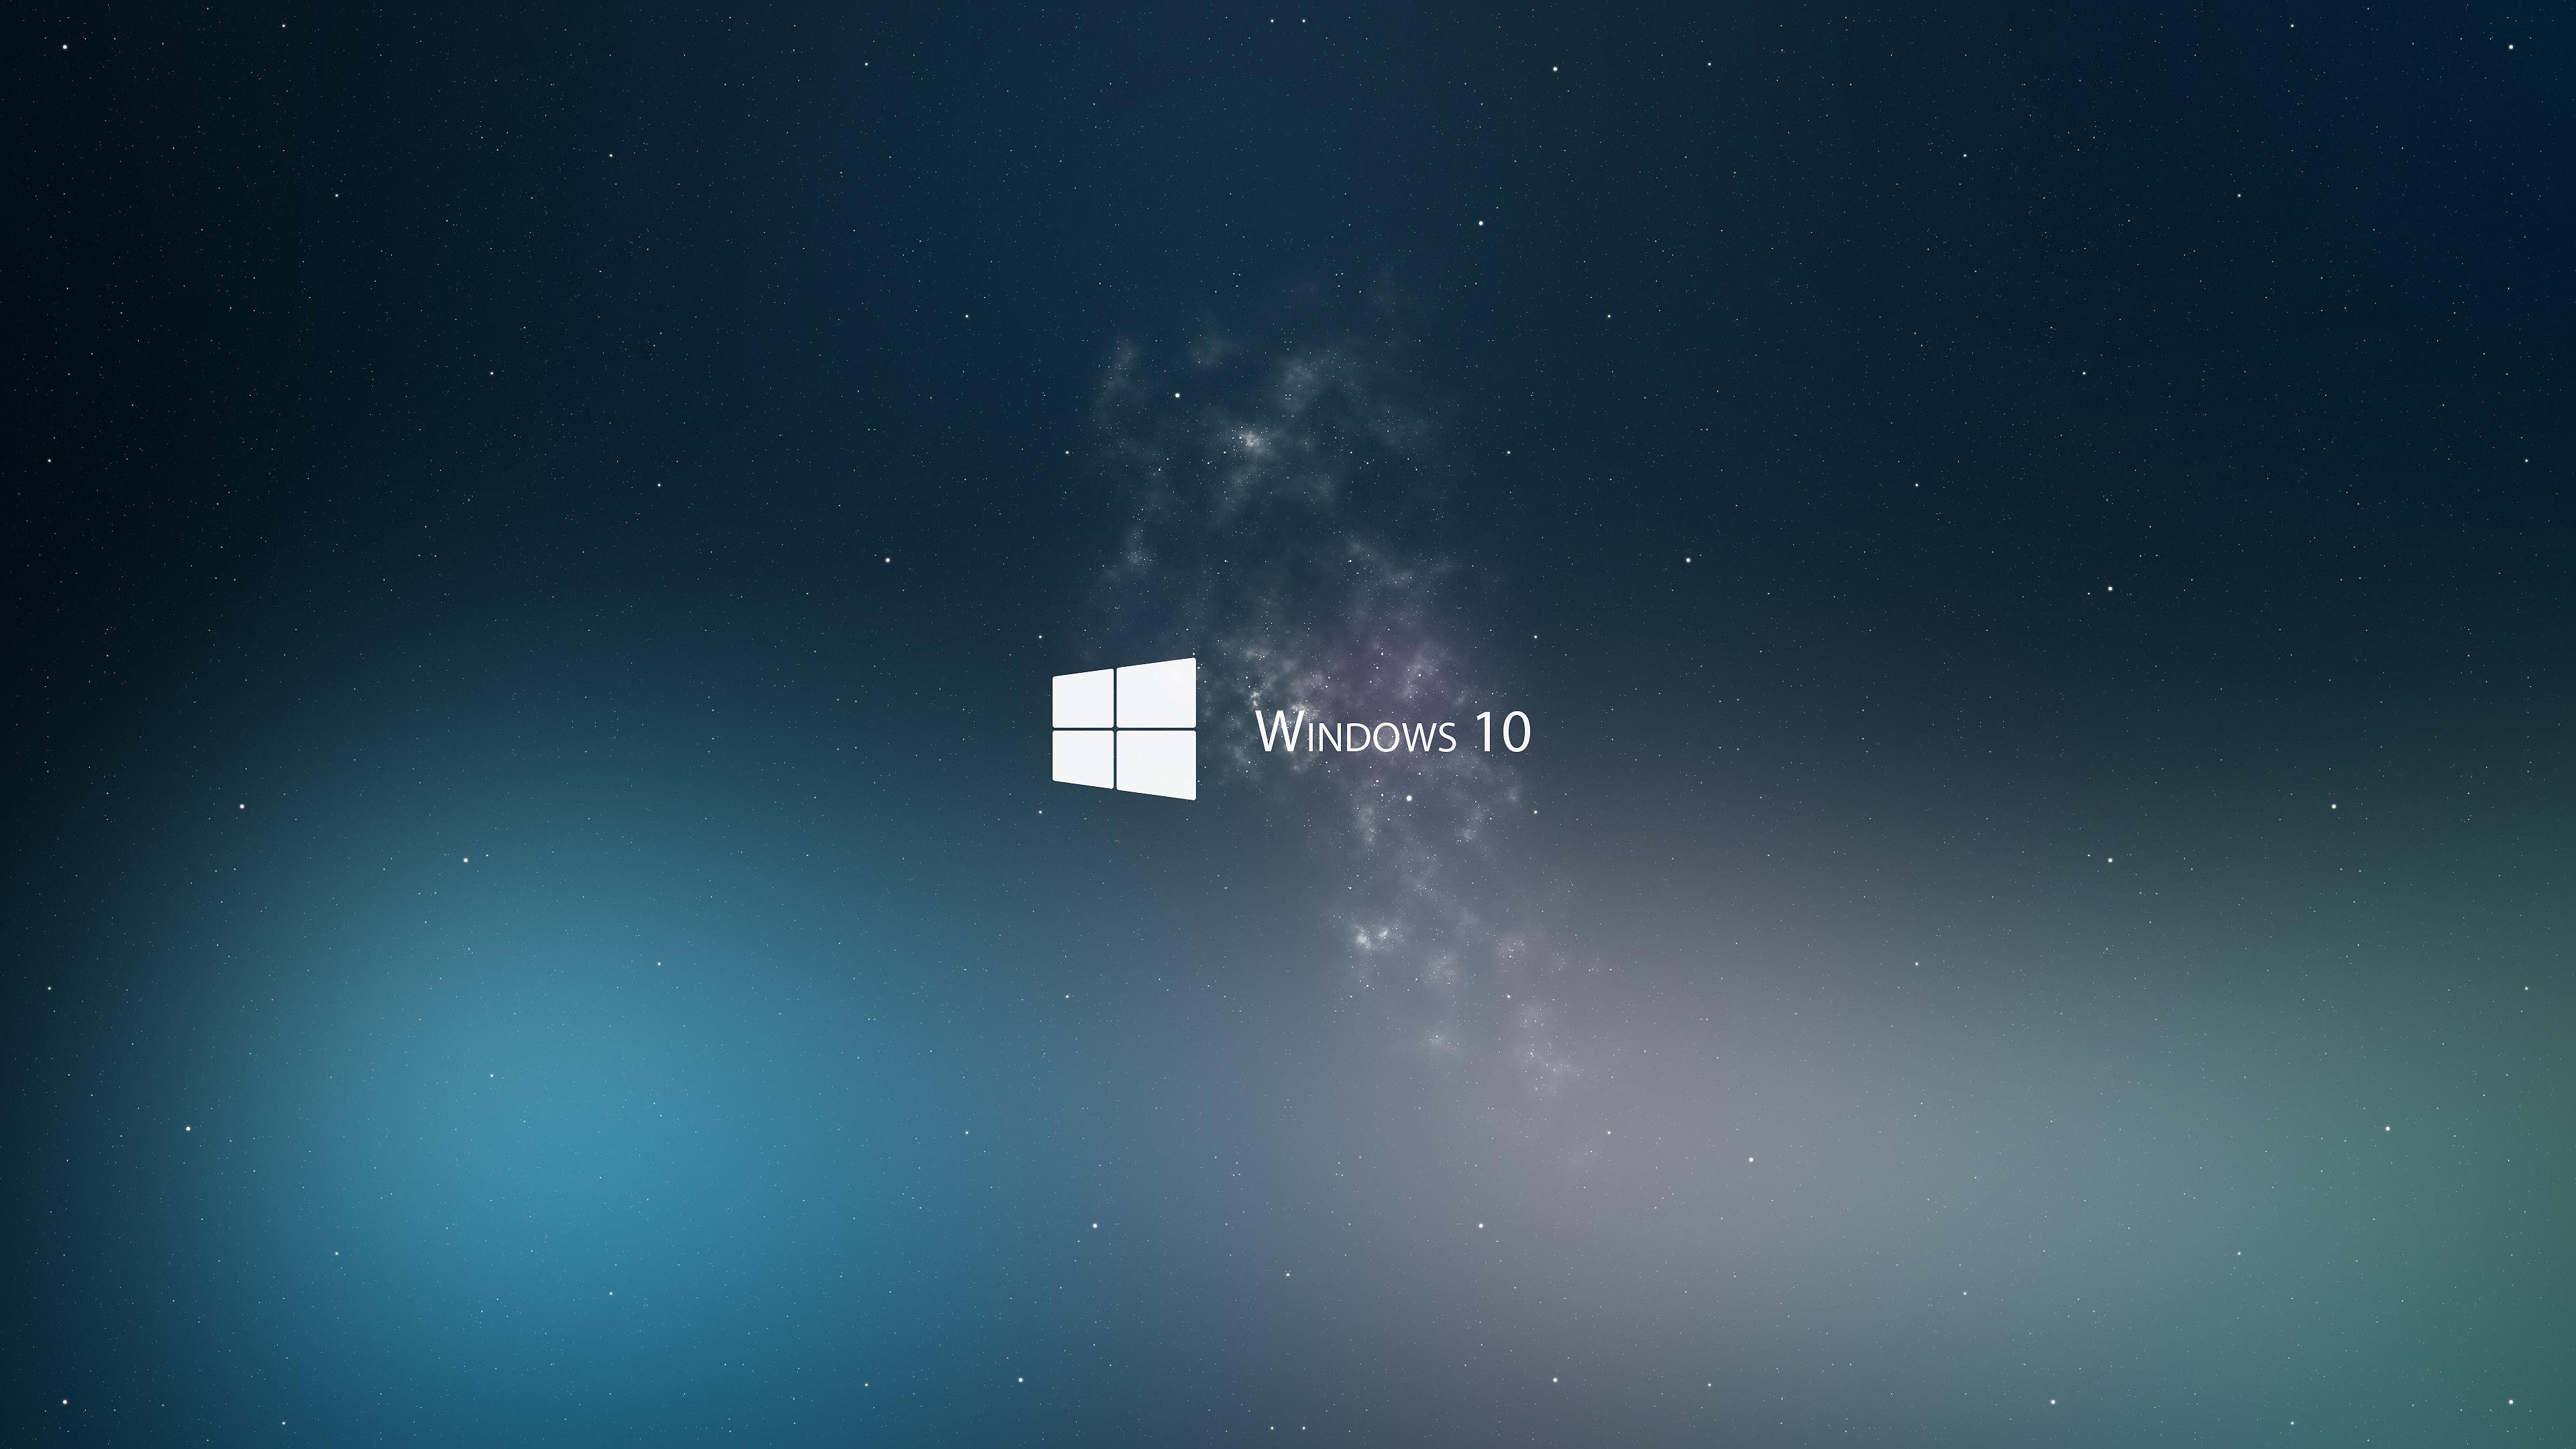 Windows 81 Wallpapers 3840x2160